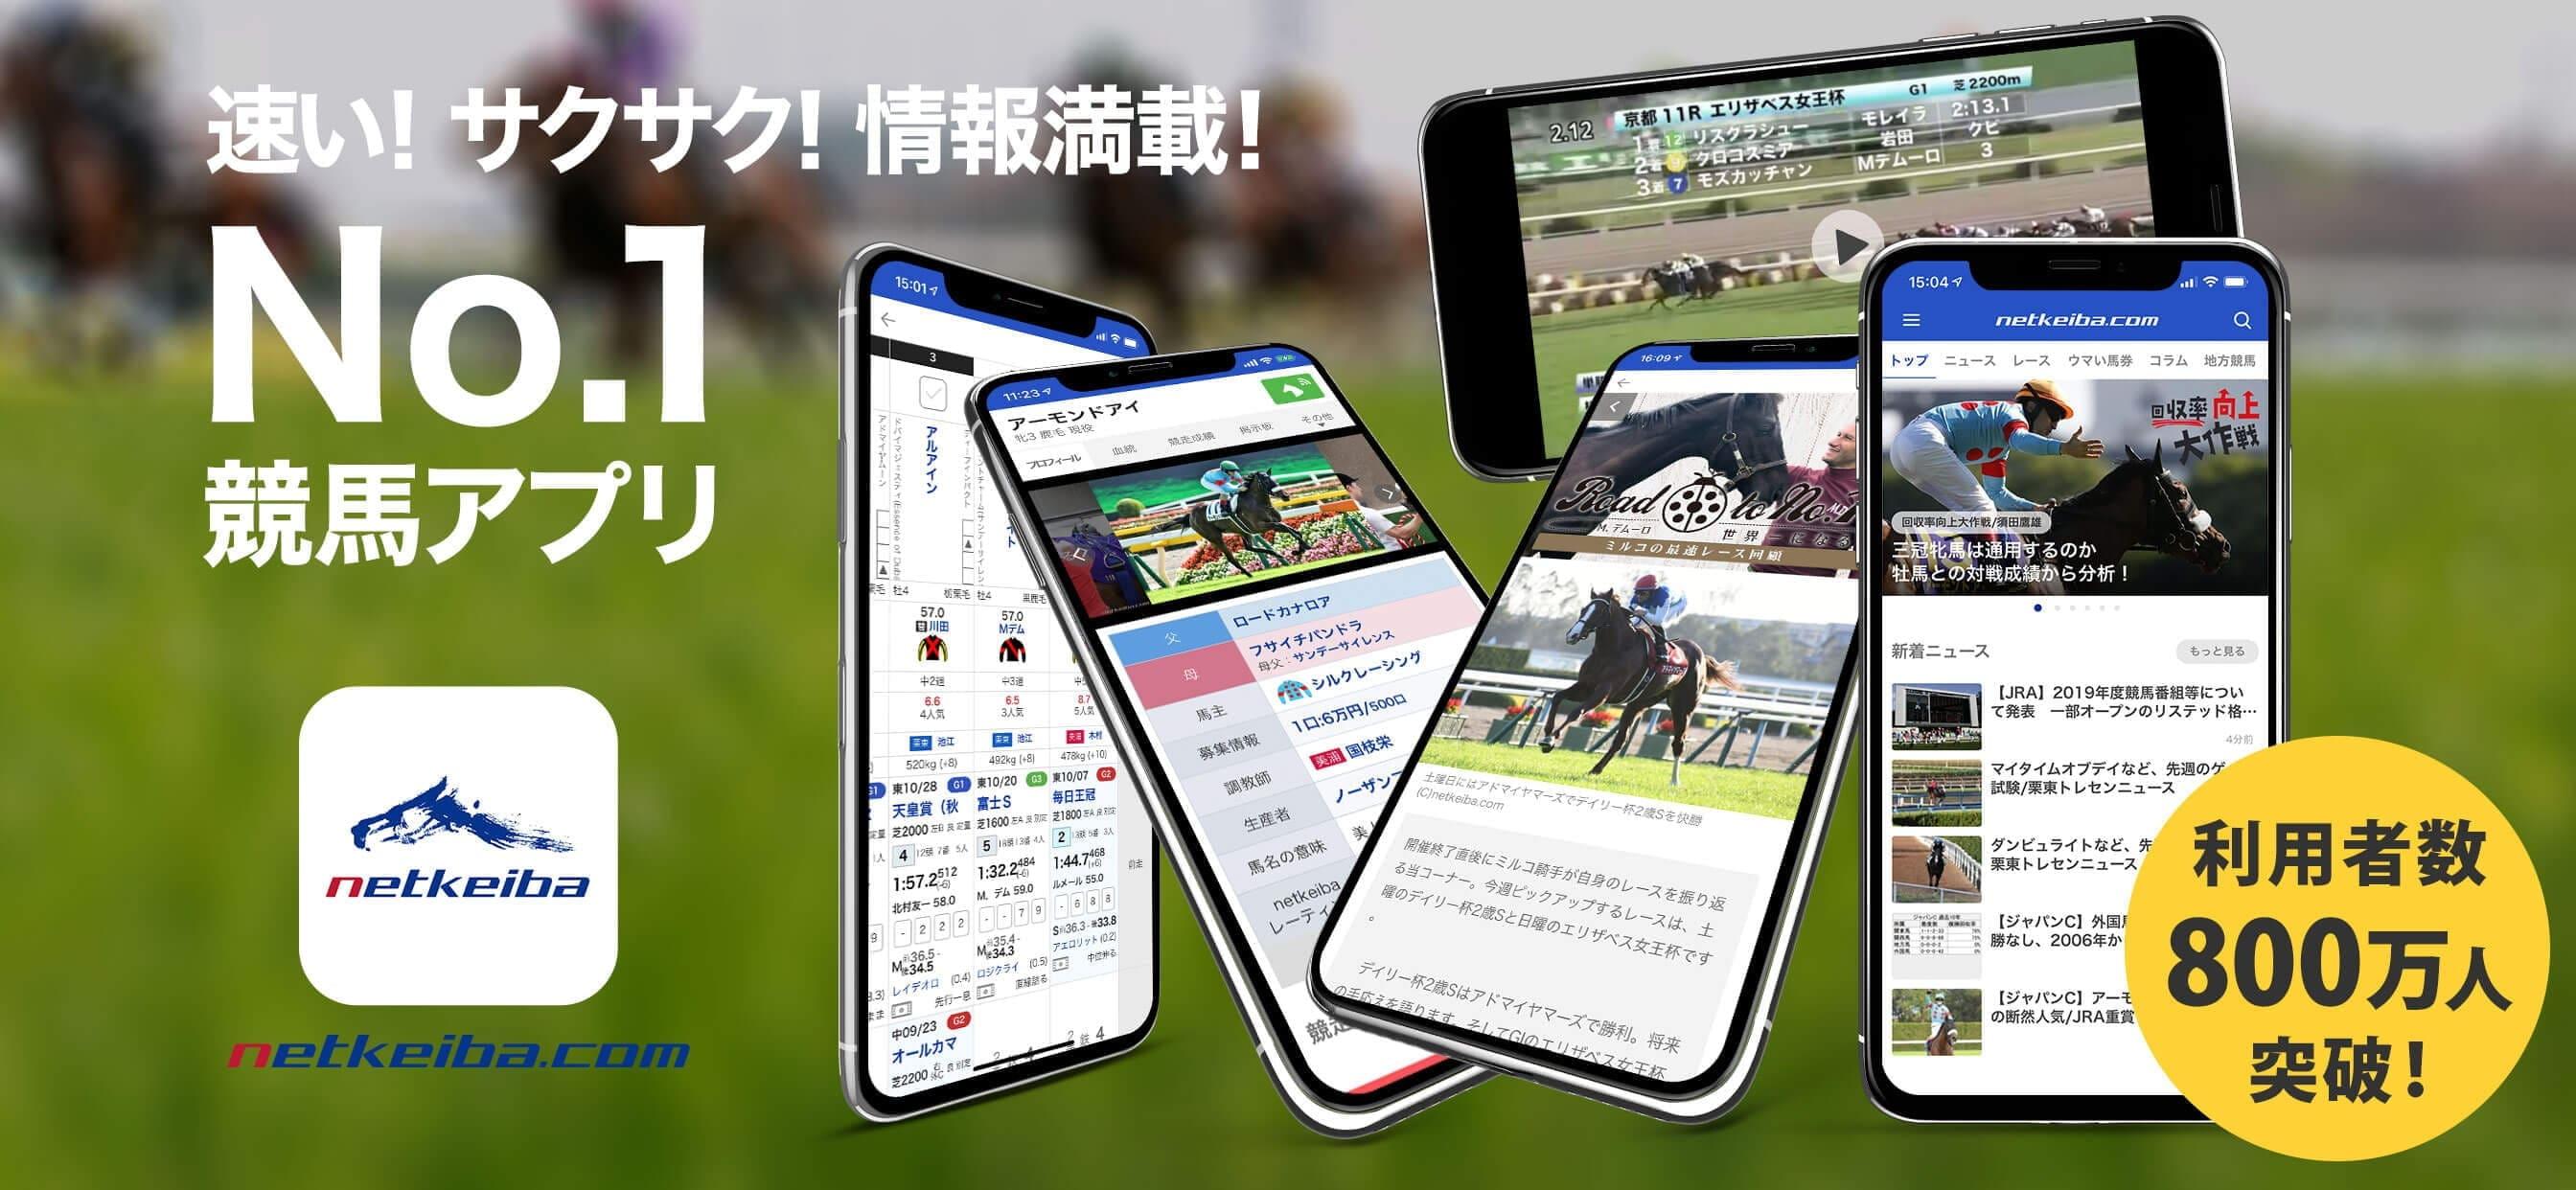 netkeiba.com アプリ